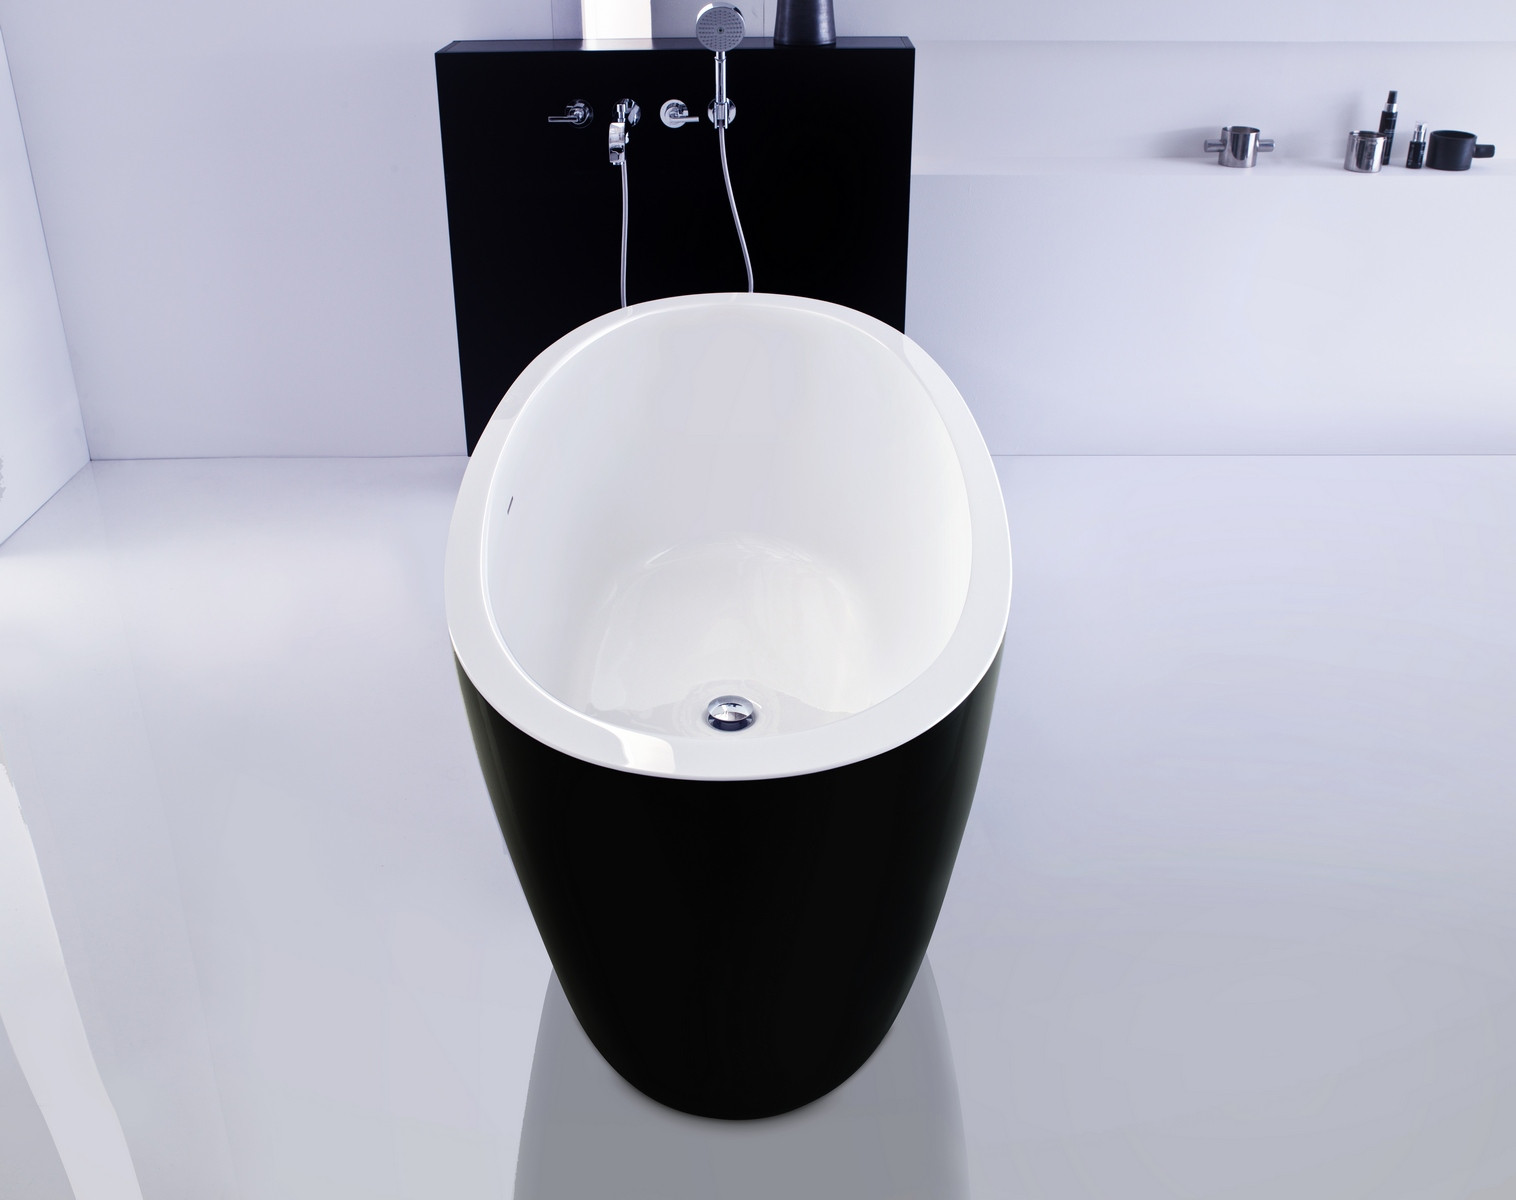 Aquatica PS174A-Blck-Wht PureScape Freestanding Acrylic Oval Shape Bathtub